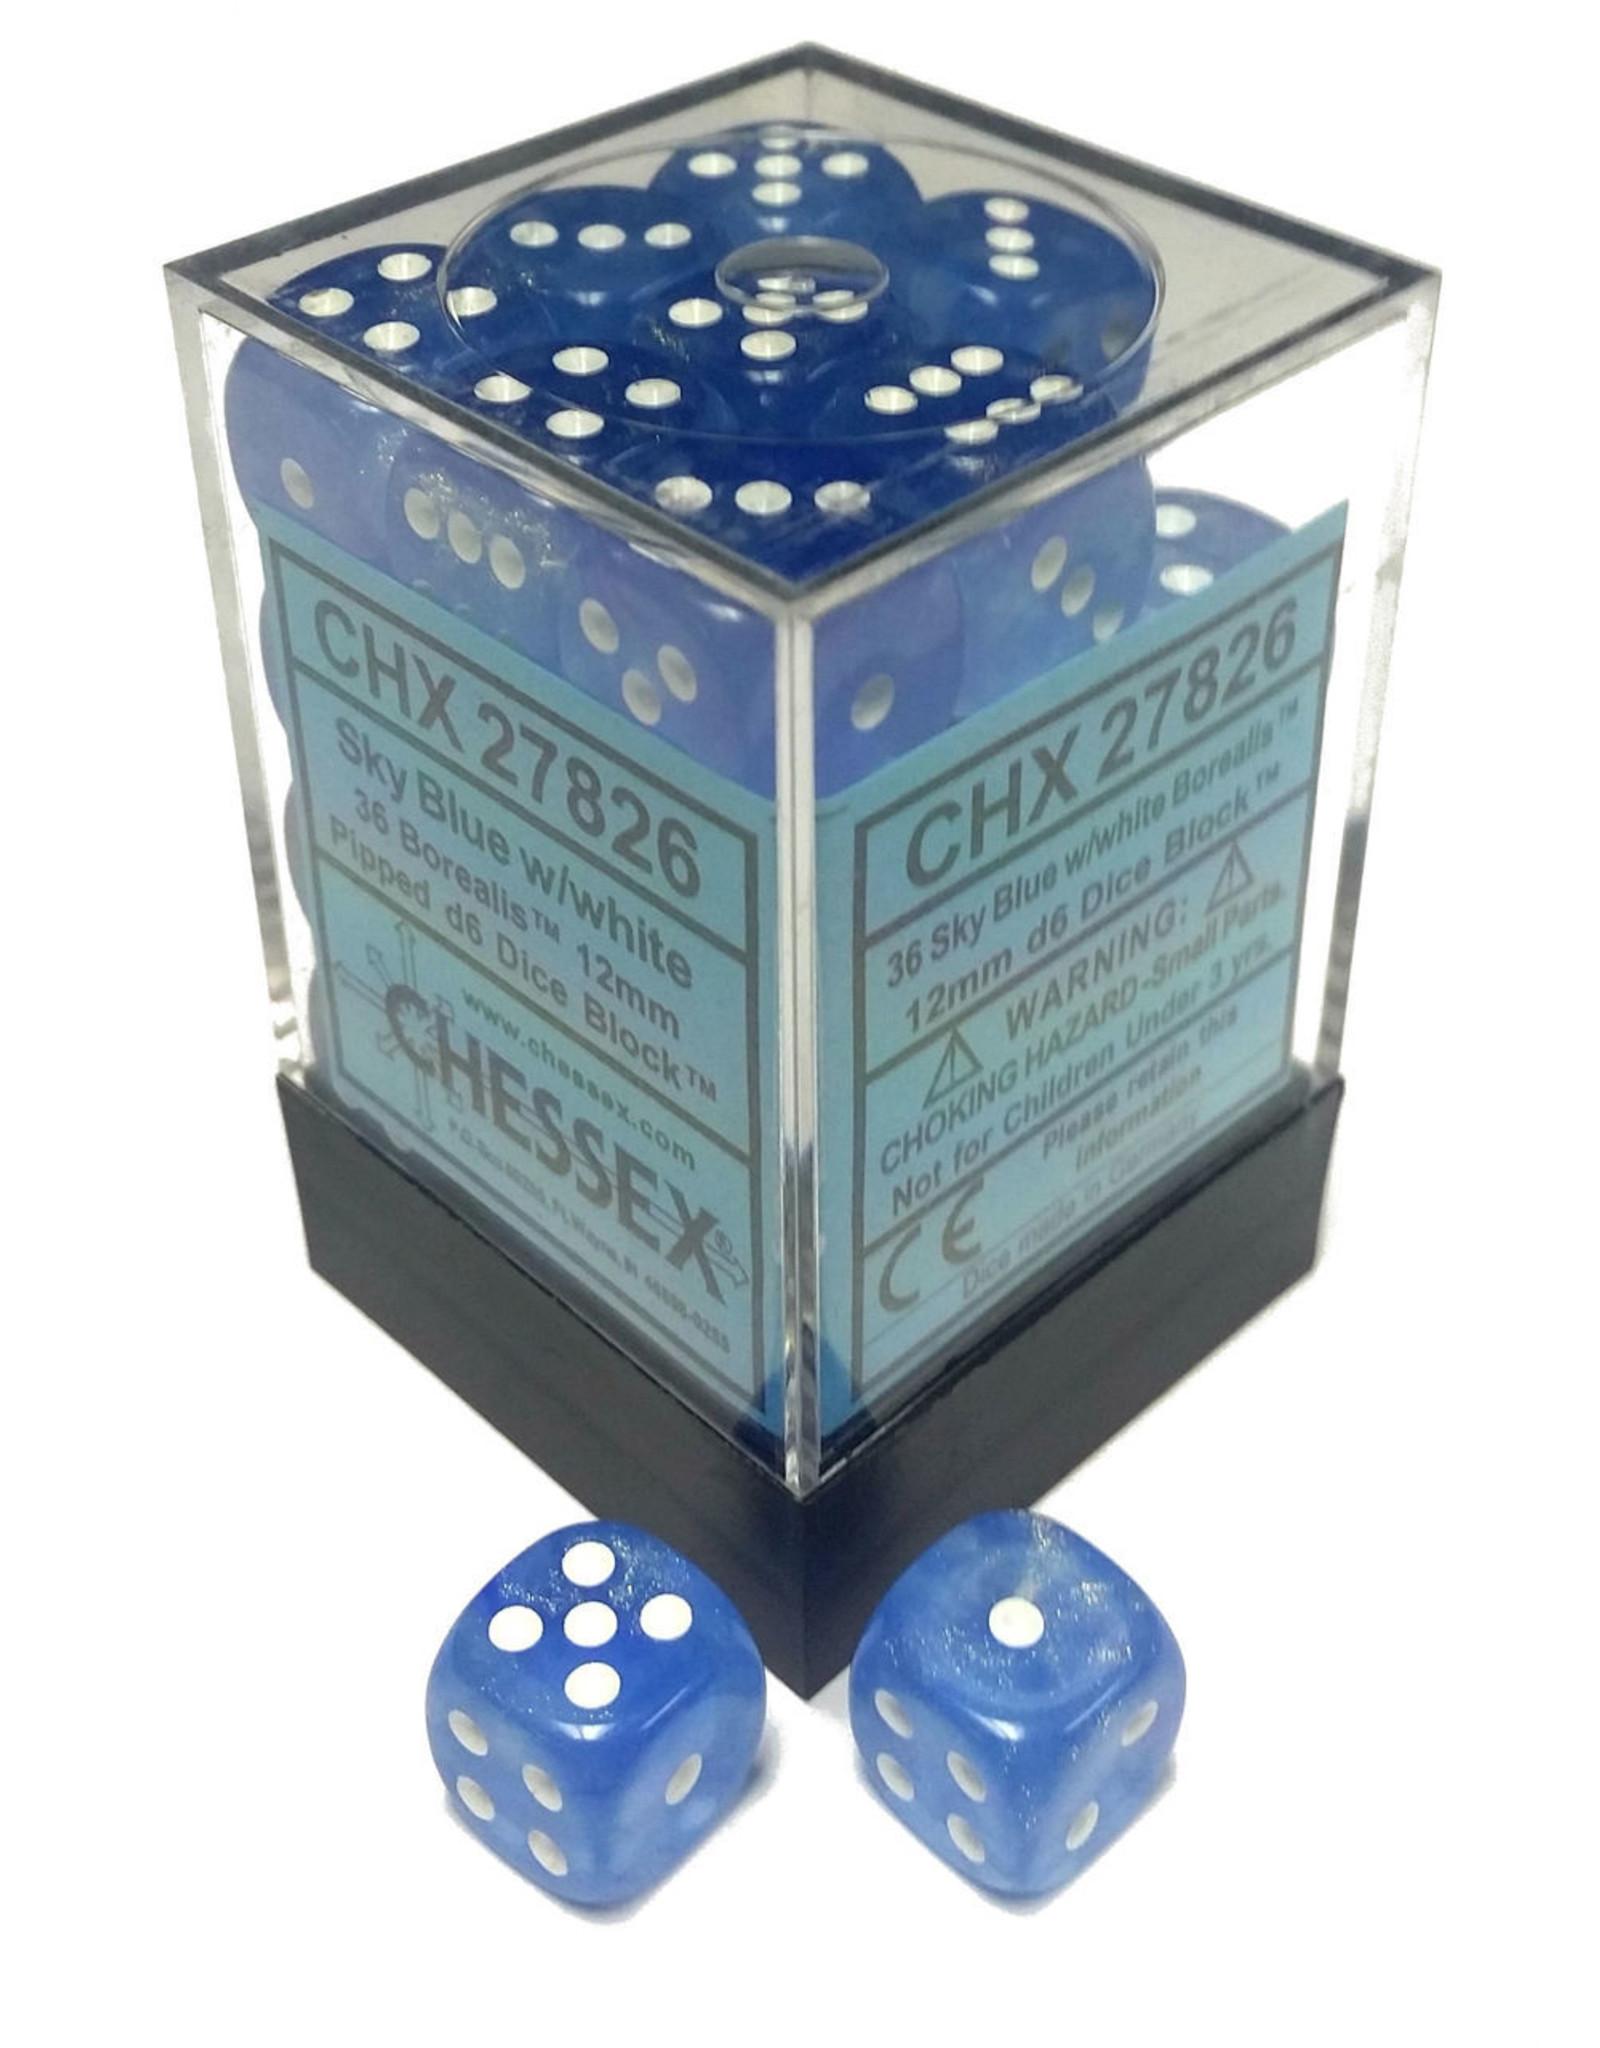 Chessex Borealis 12mm D6 Sky Blue/wht